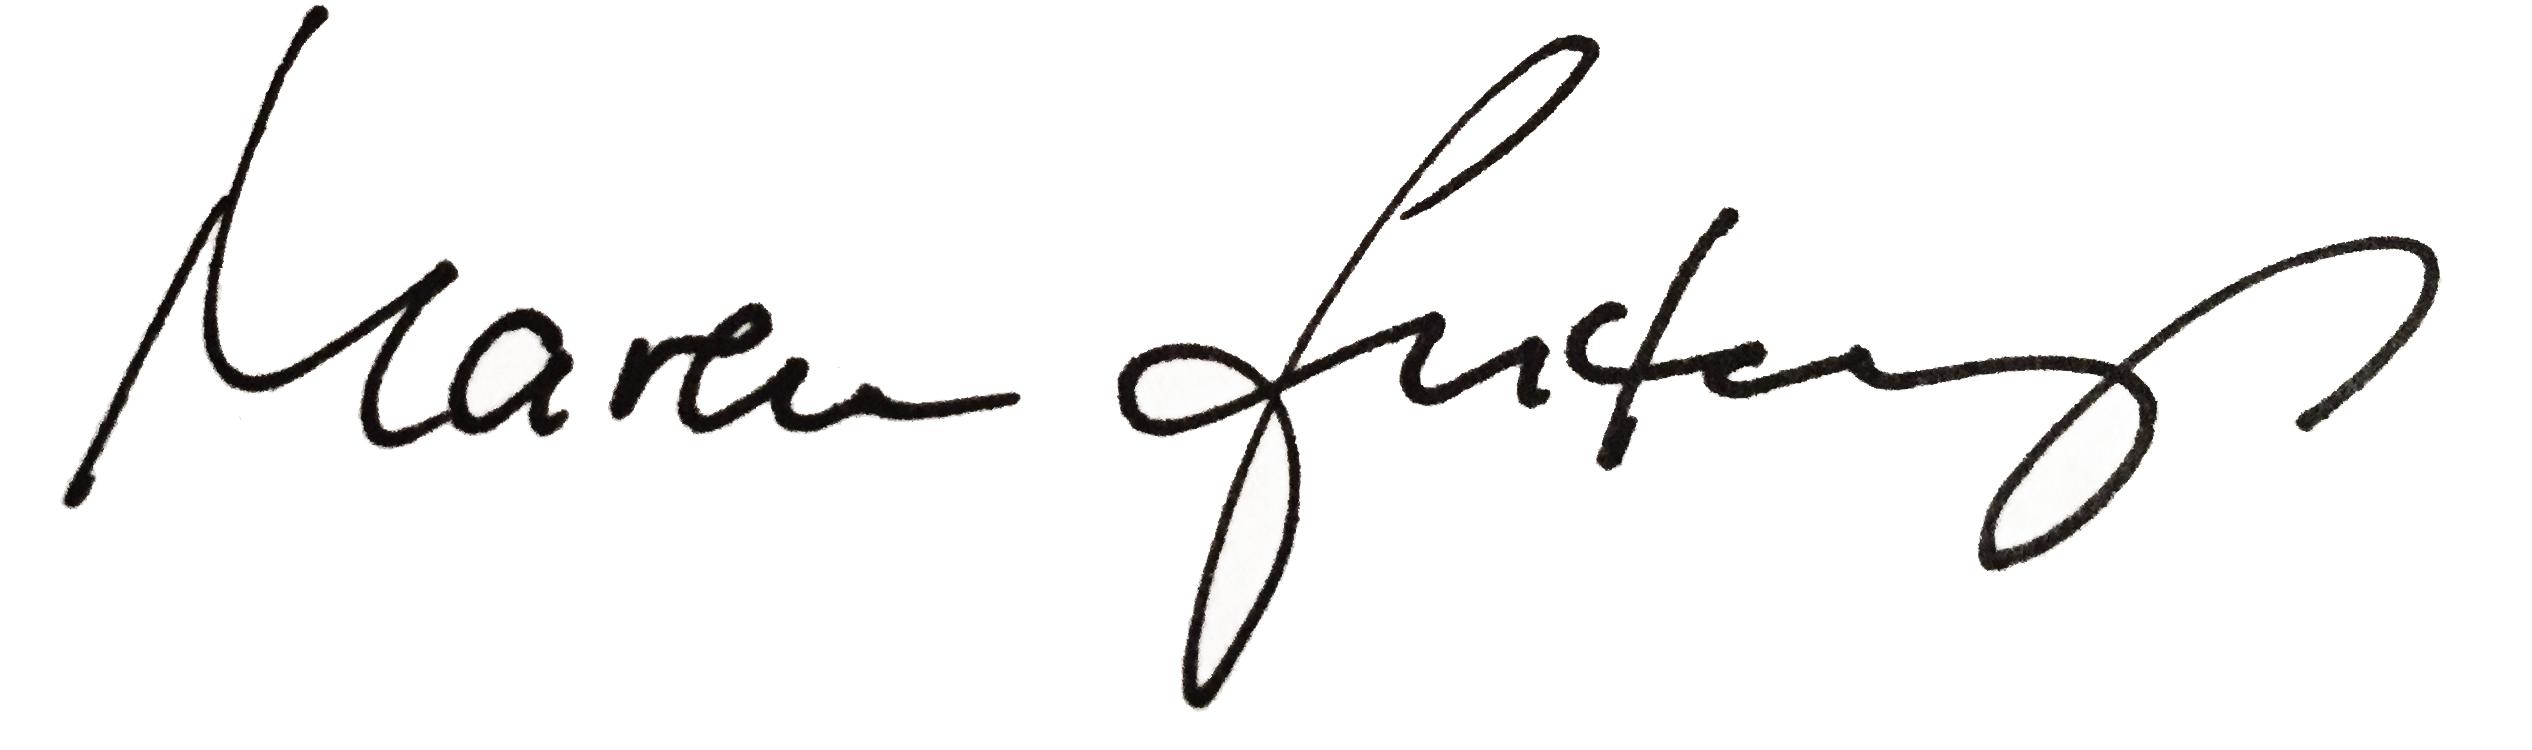 Hundeclique_Unterschrift-black